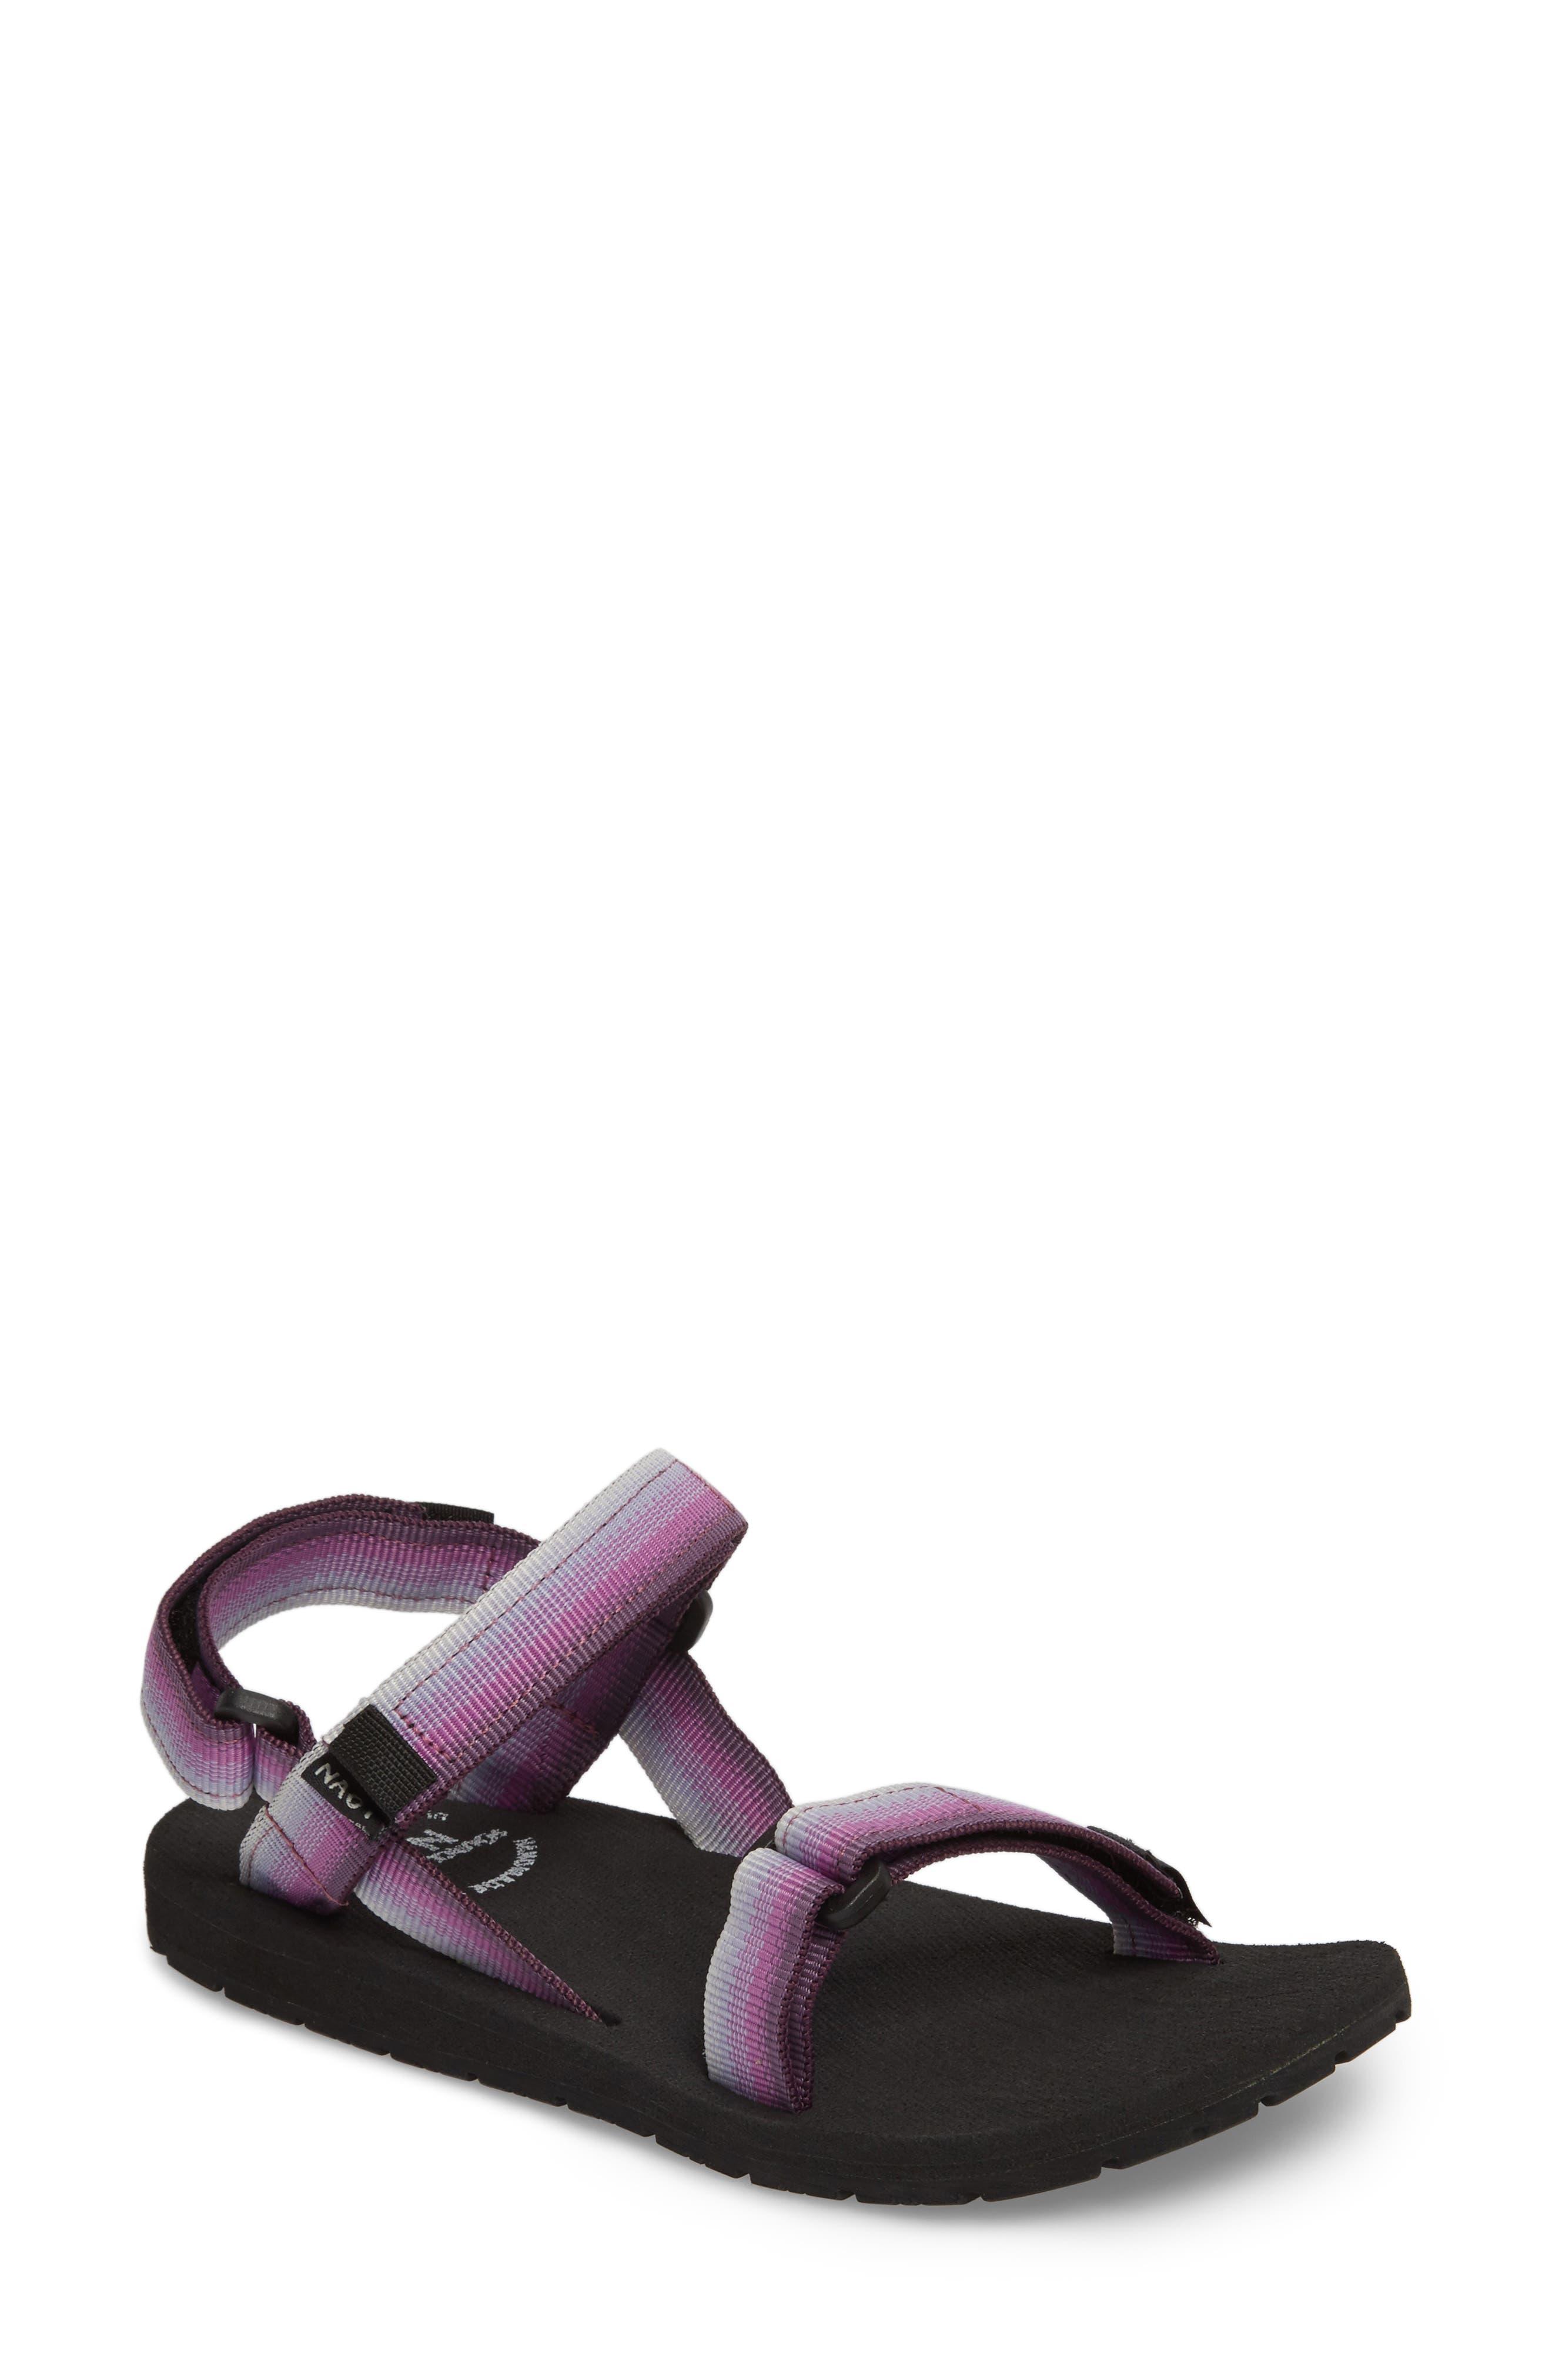 Haven Waterproof Sandal,                             Main thumbnail 1, color,                             Purple Sunset Fabric